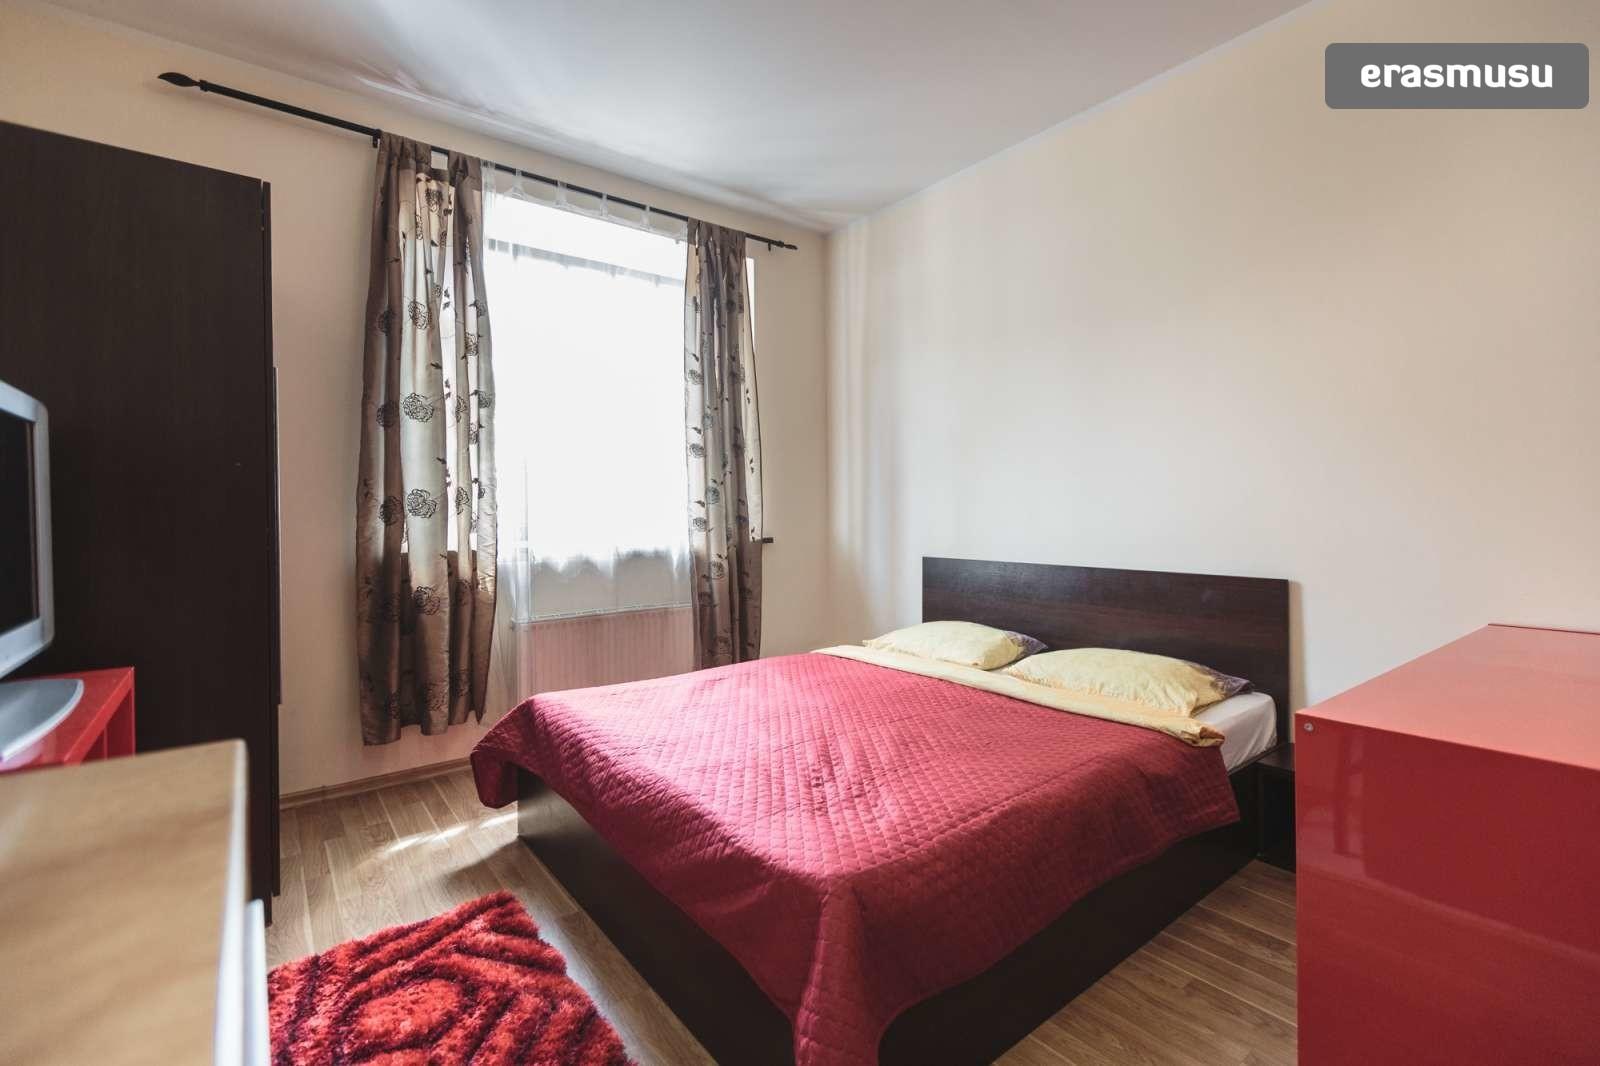 modern-studio-apartment-rent-maskavas-forstate-ba8c480fd477a9a4b